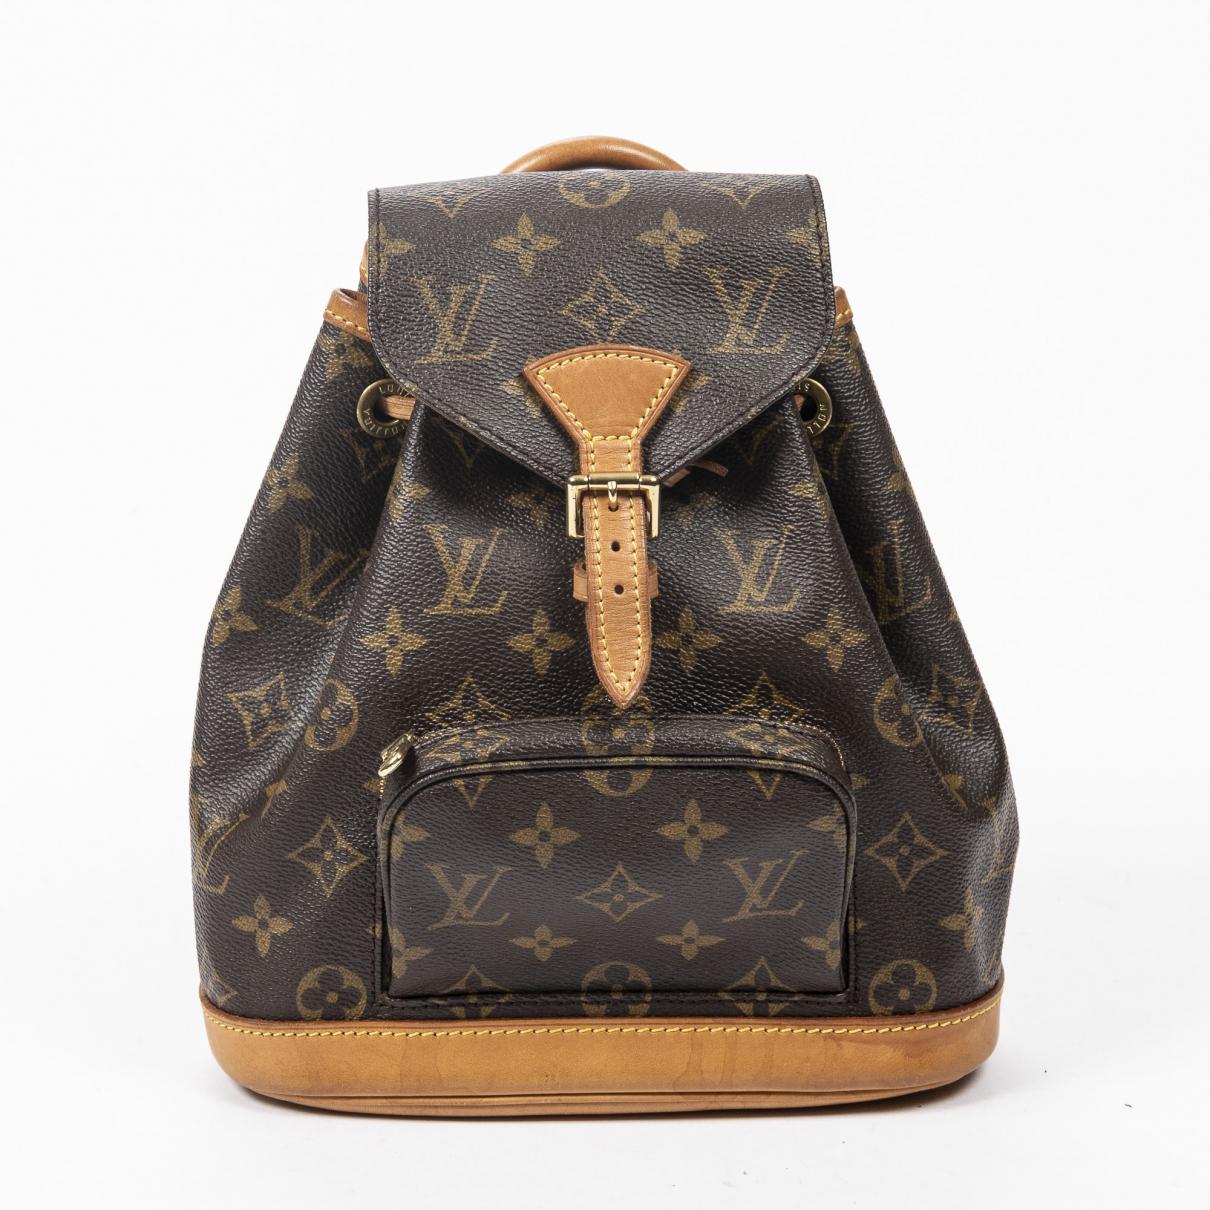 Louis Vuitton - Sac a main   pour femme en coton - marron